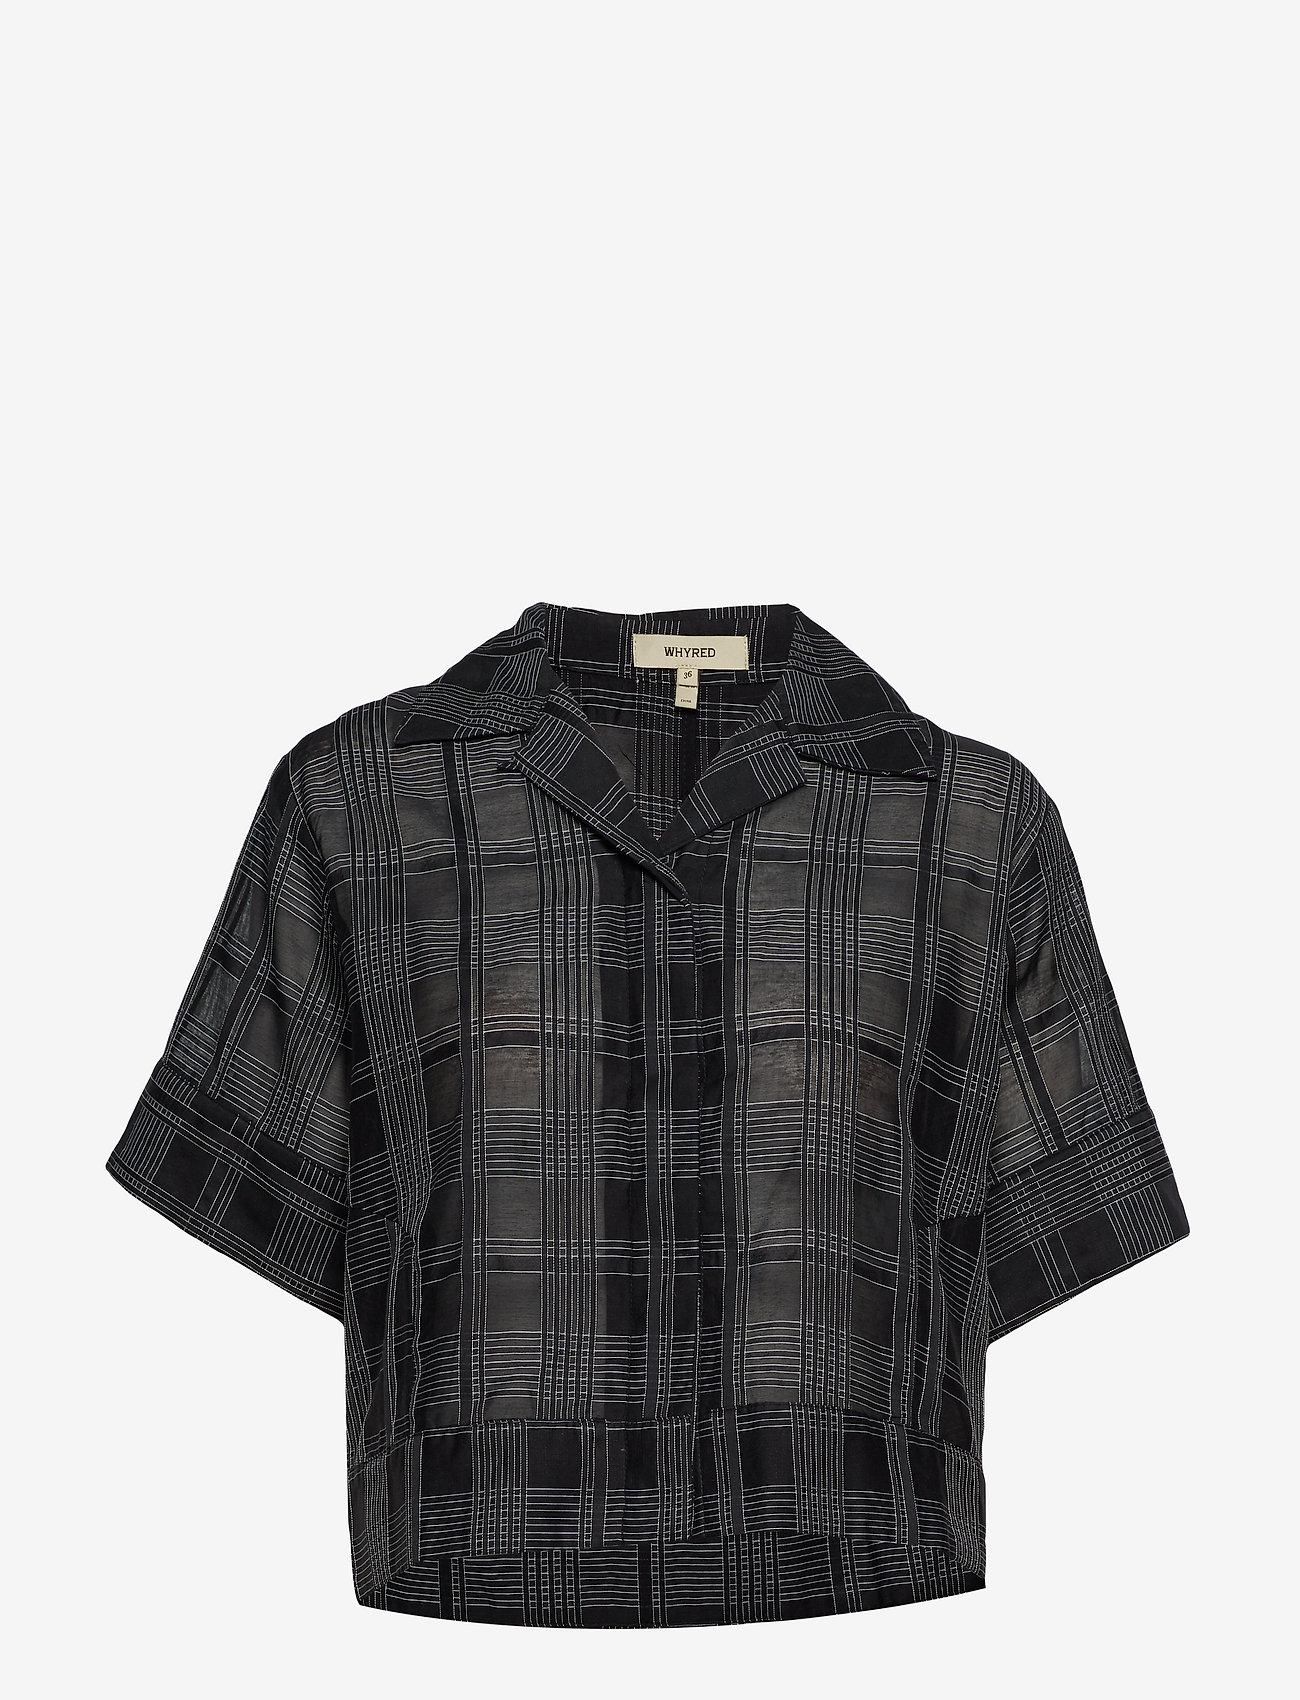 Whyred - MACKENZIE GEOMETRIC - chemises à manches courtes - black / white - 0